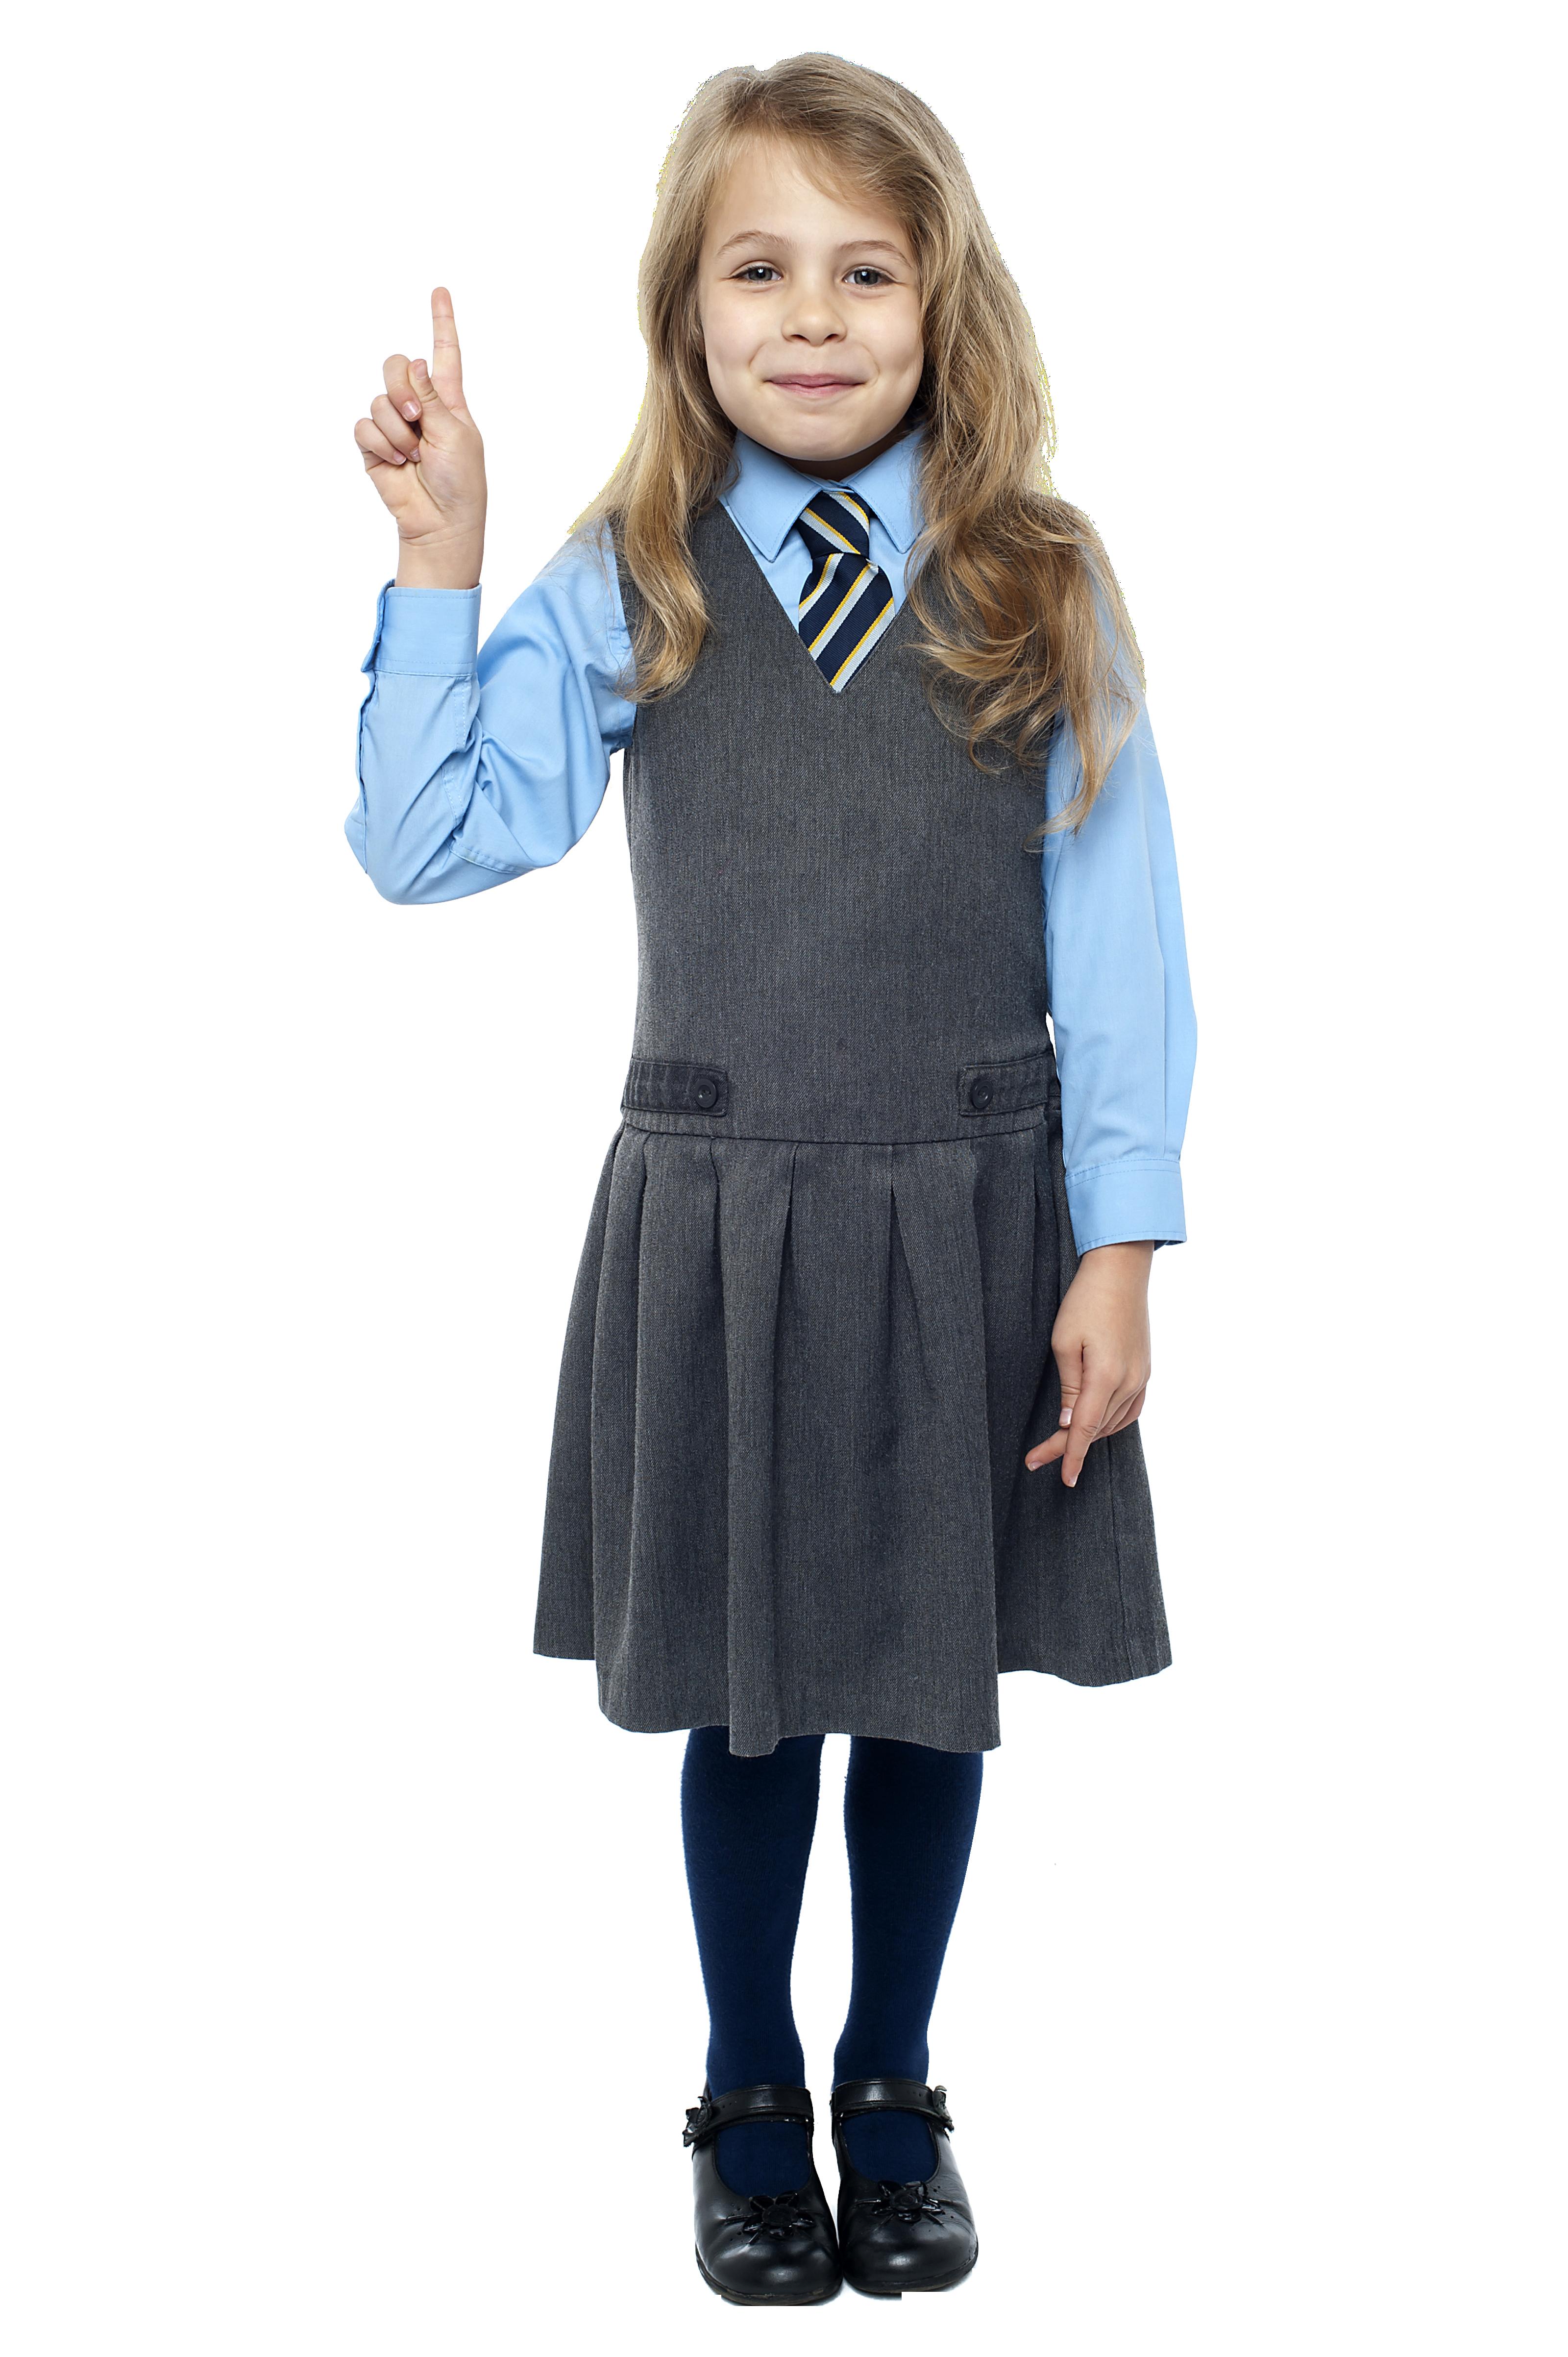 School Girl PNG Image